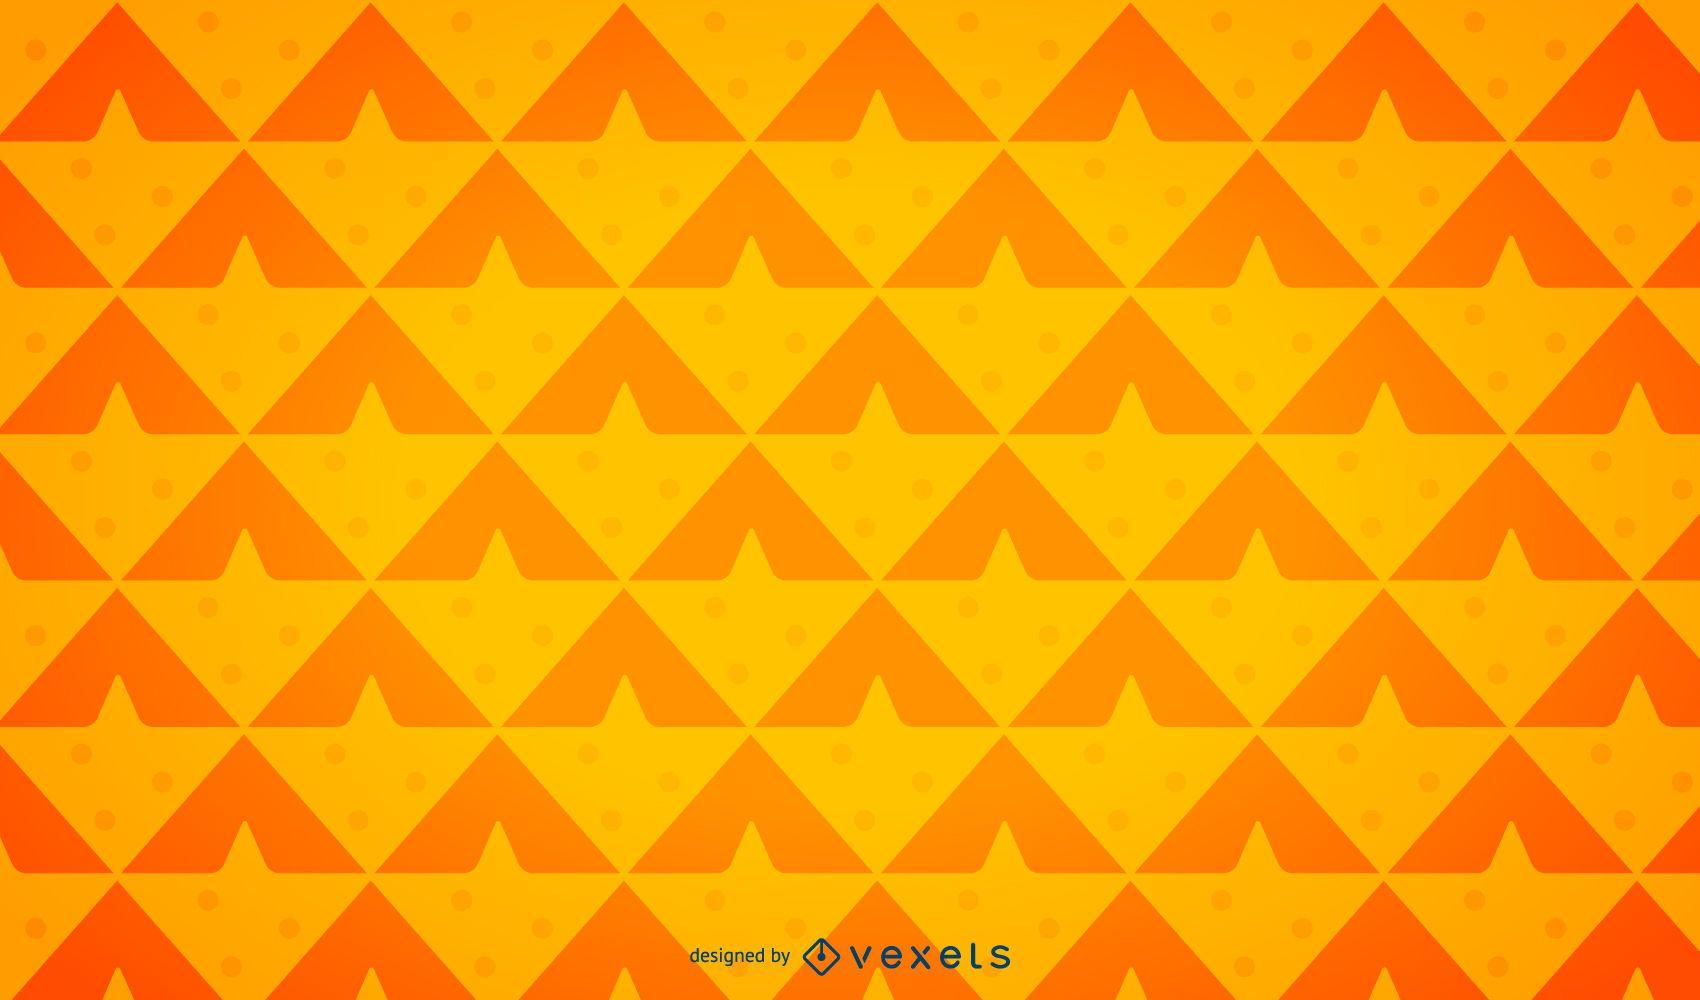 Minimalist pineapple background pattern